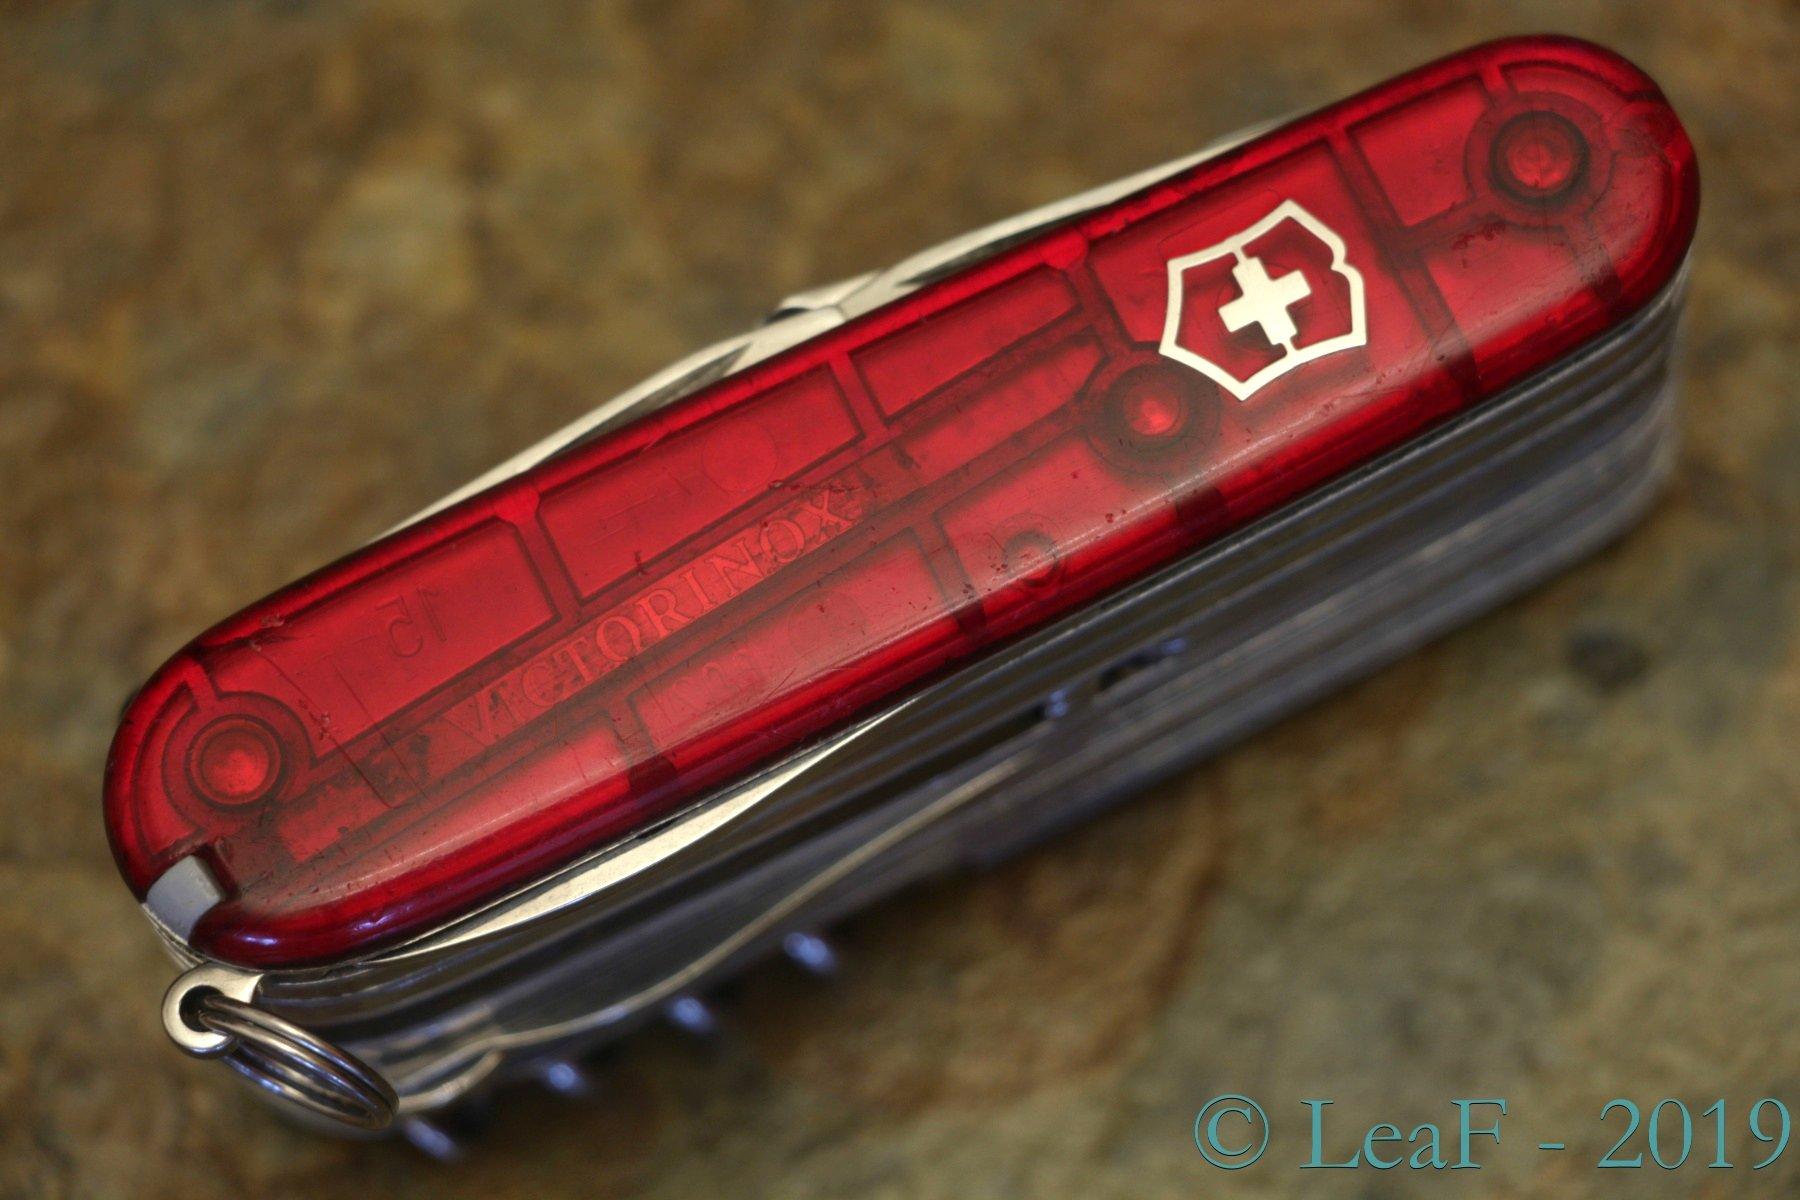 247 Swisschamp Xlt Leaf S Victorinox Knives Collection